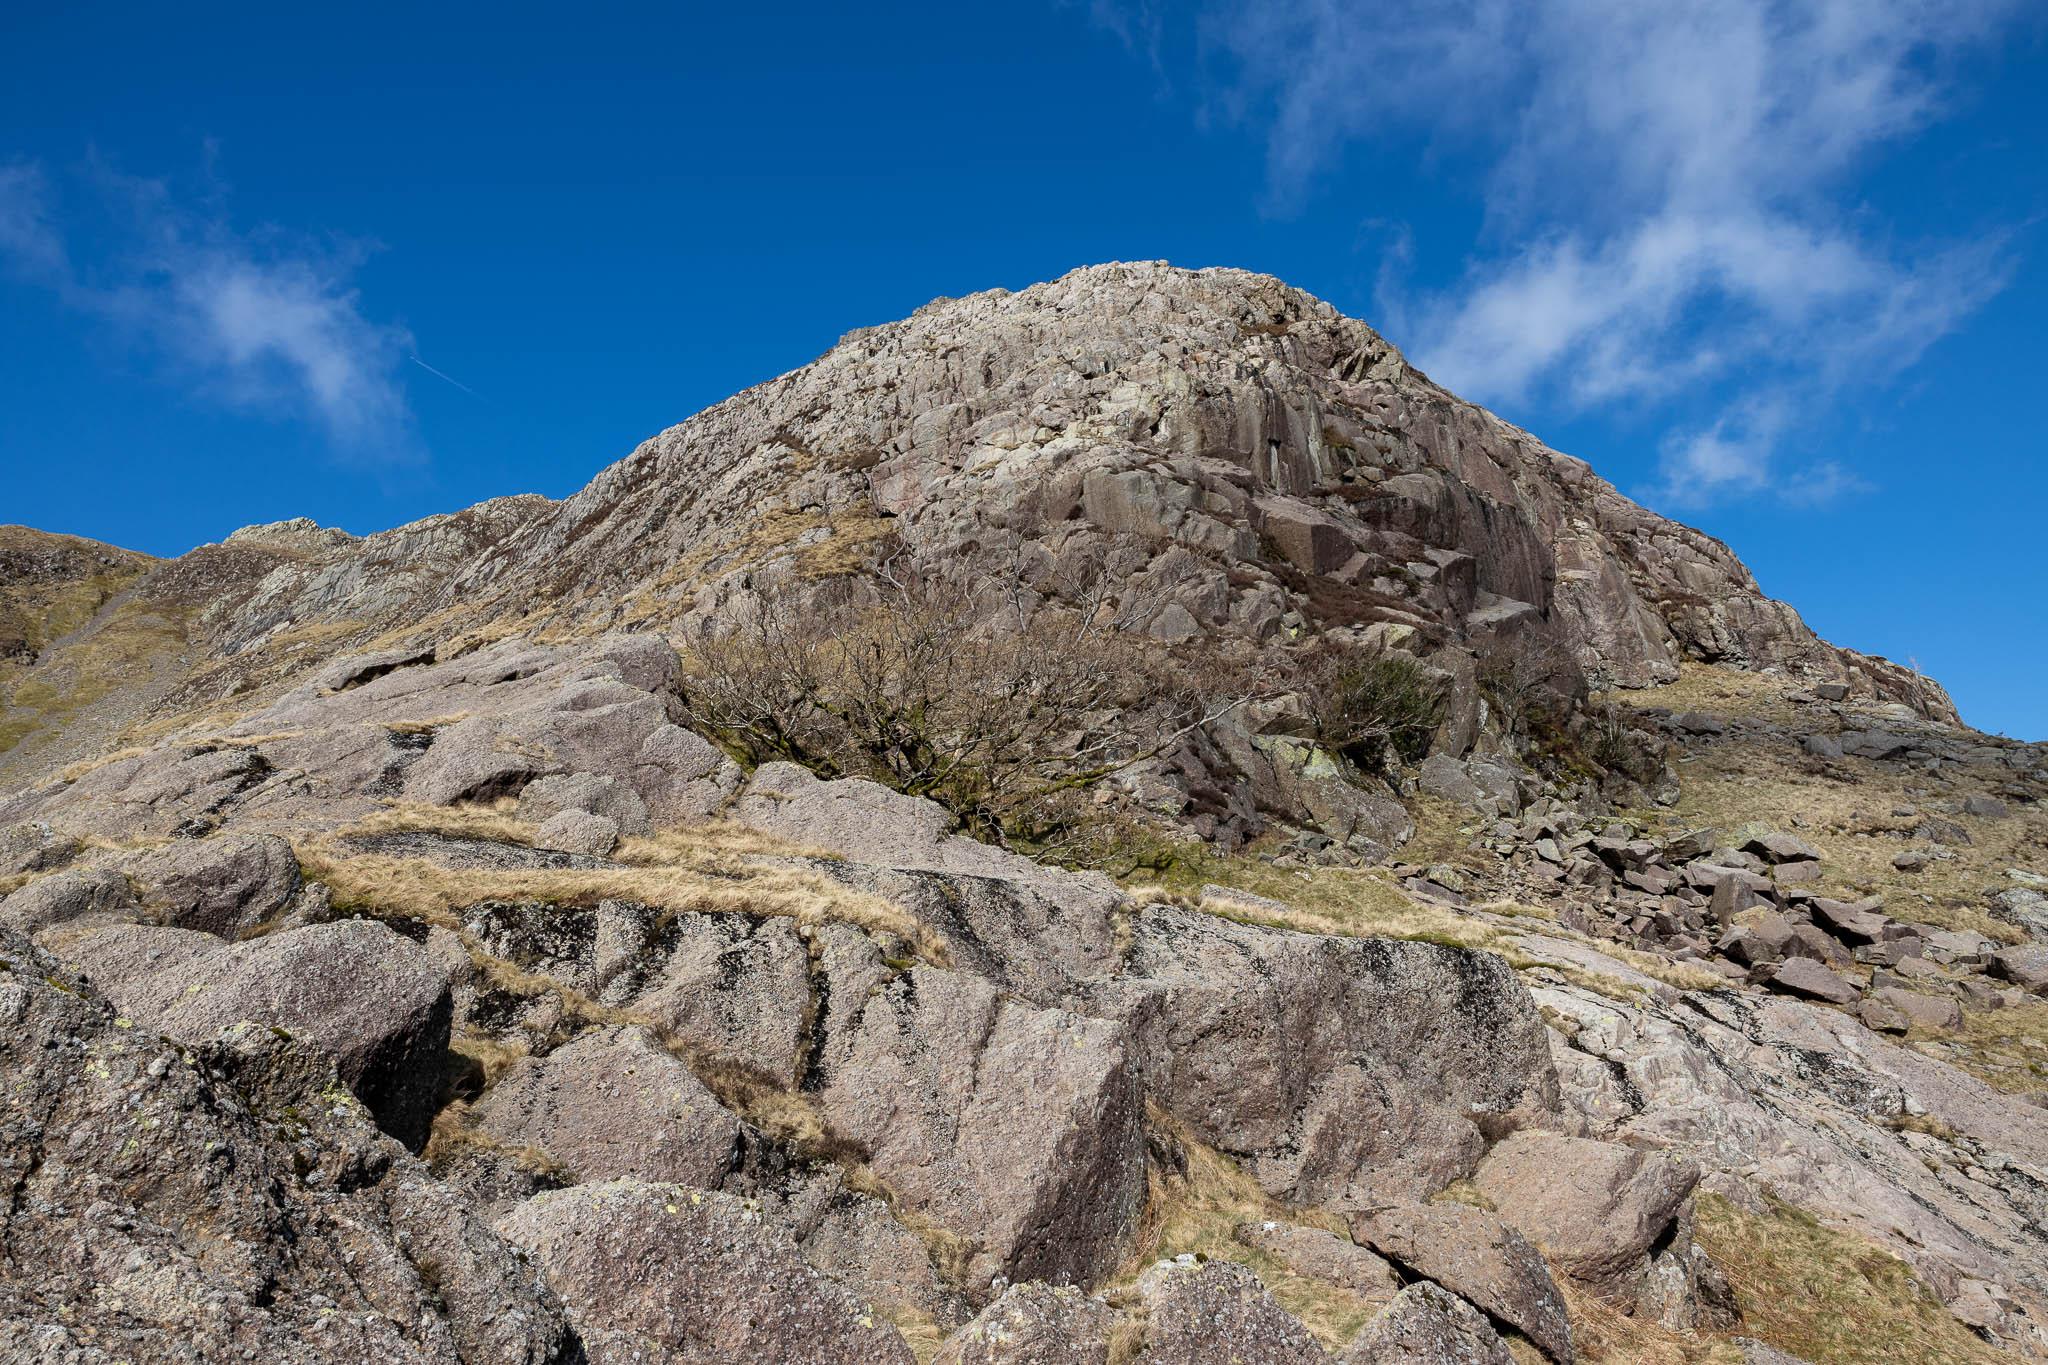 The main part of Cam Crag Ridge looming ahead